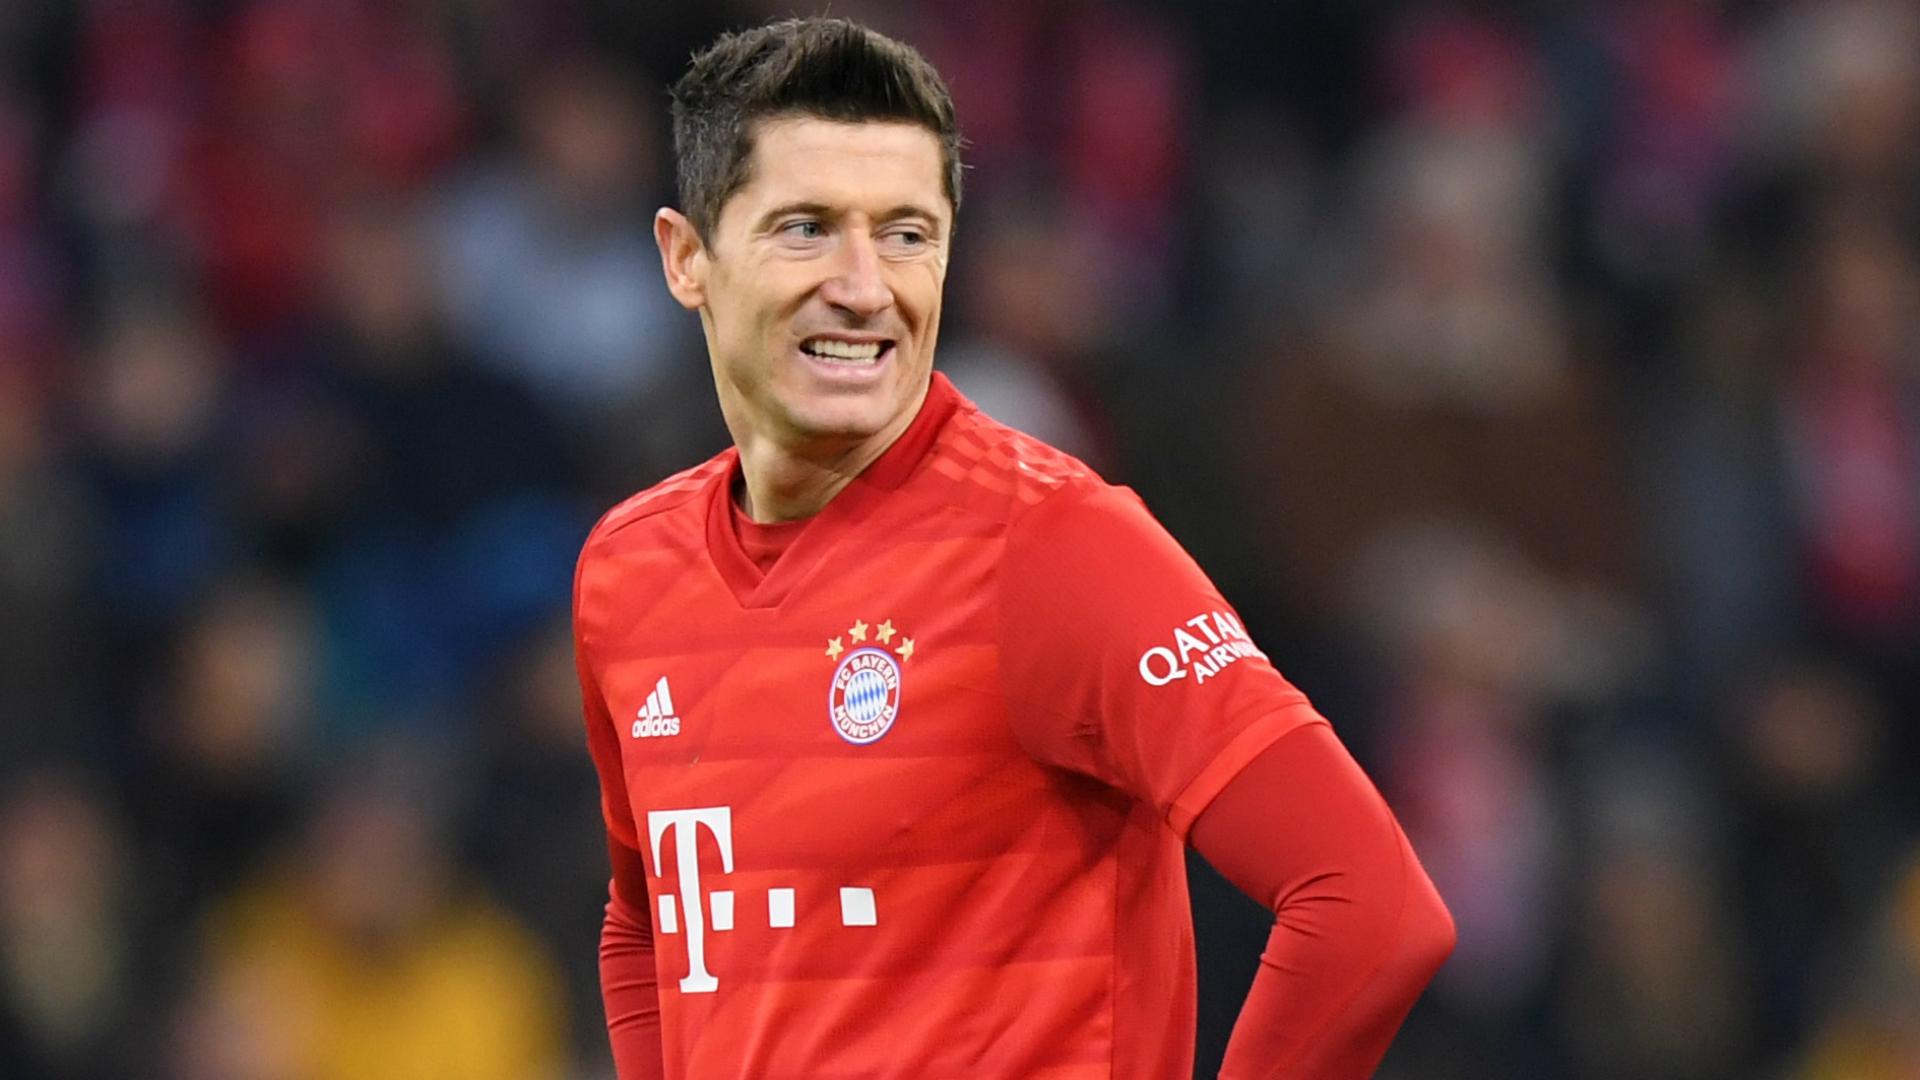 Lewandowski to have groin surgery after Bayern's clash with Wolfsburg